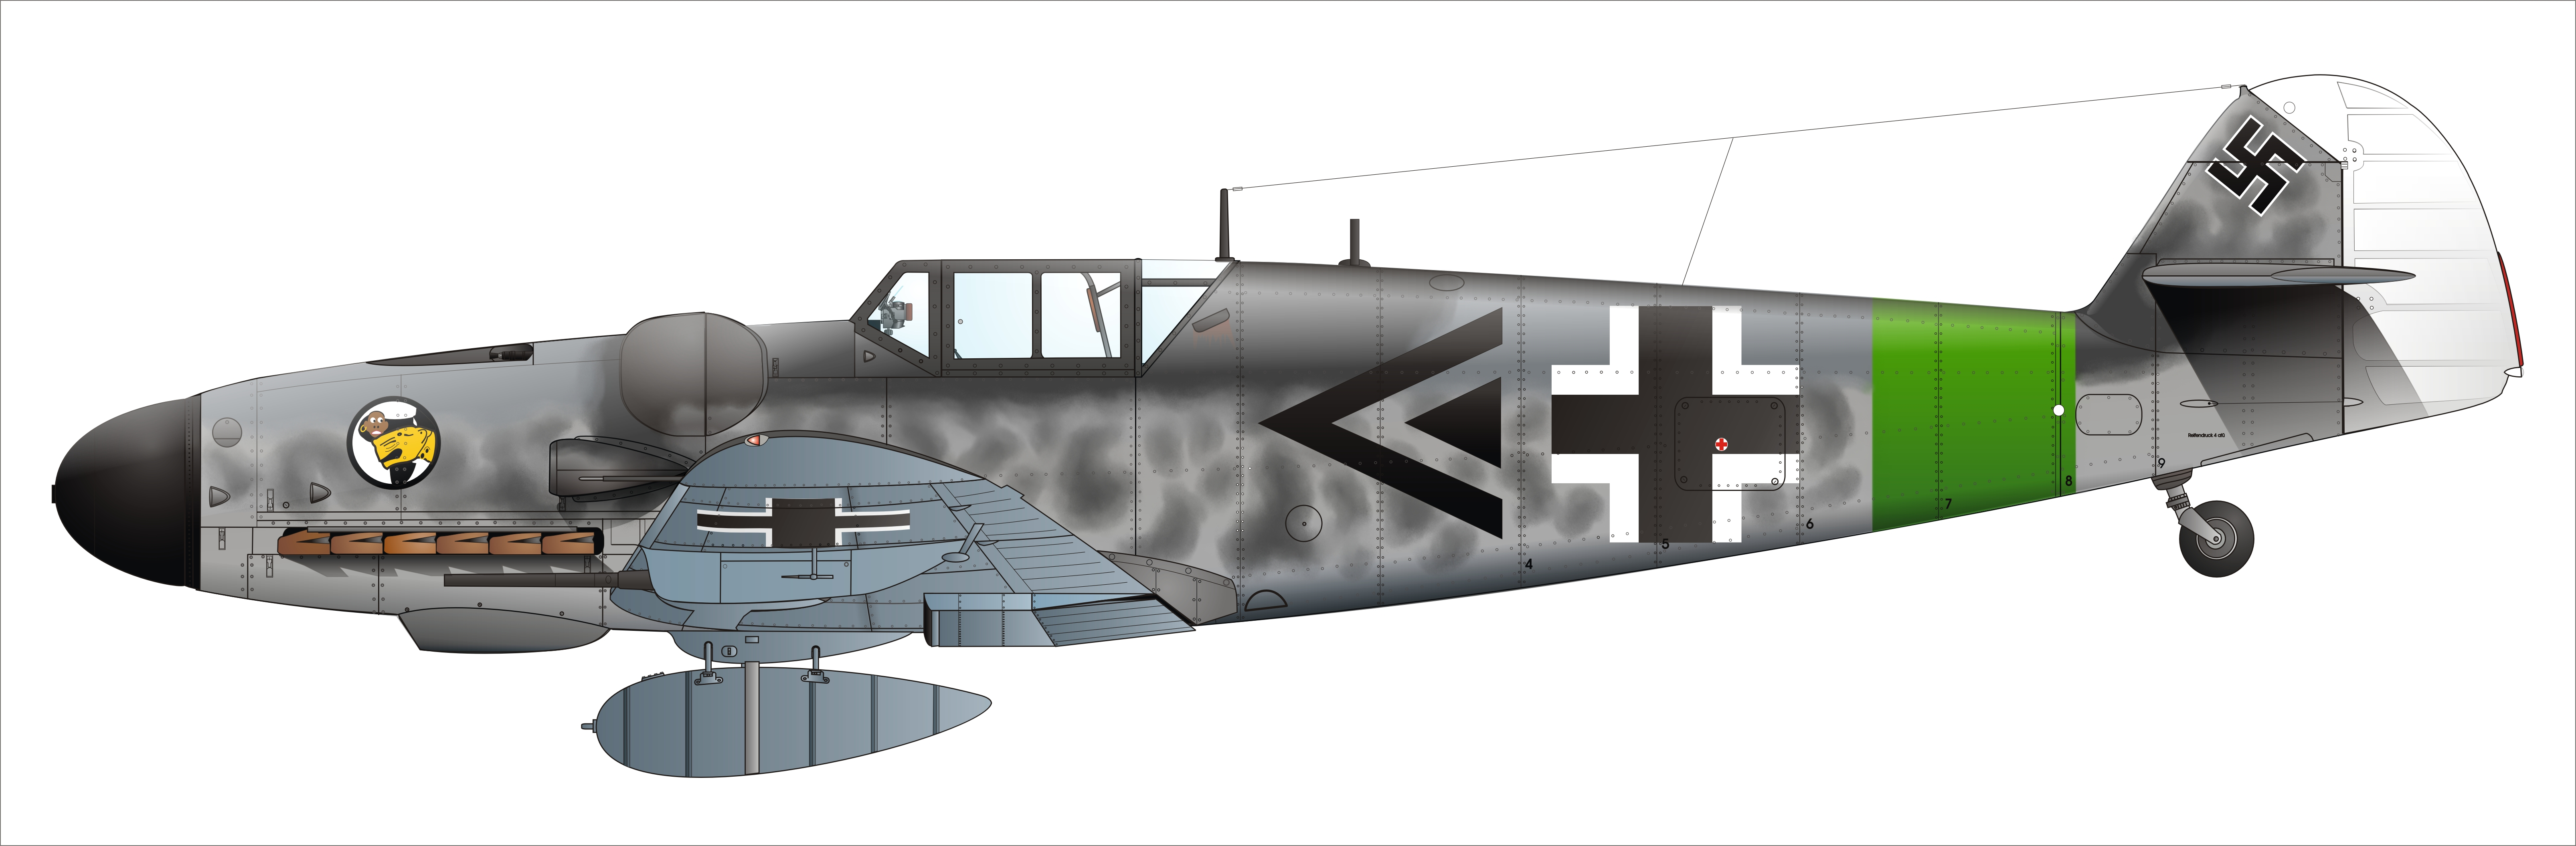 http://upload.wikimedia.org/wikipedia/commons/3/3b/Bf109_G_Farbe_eingezogen.jpg